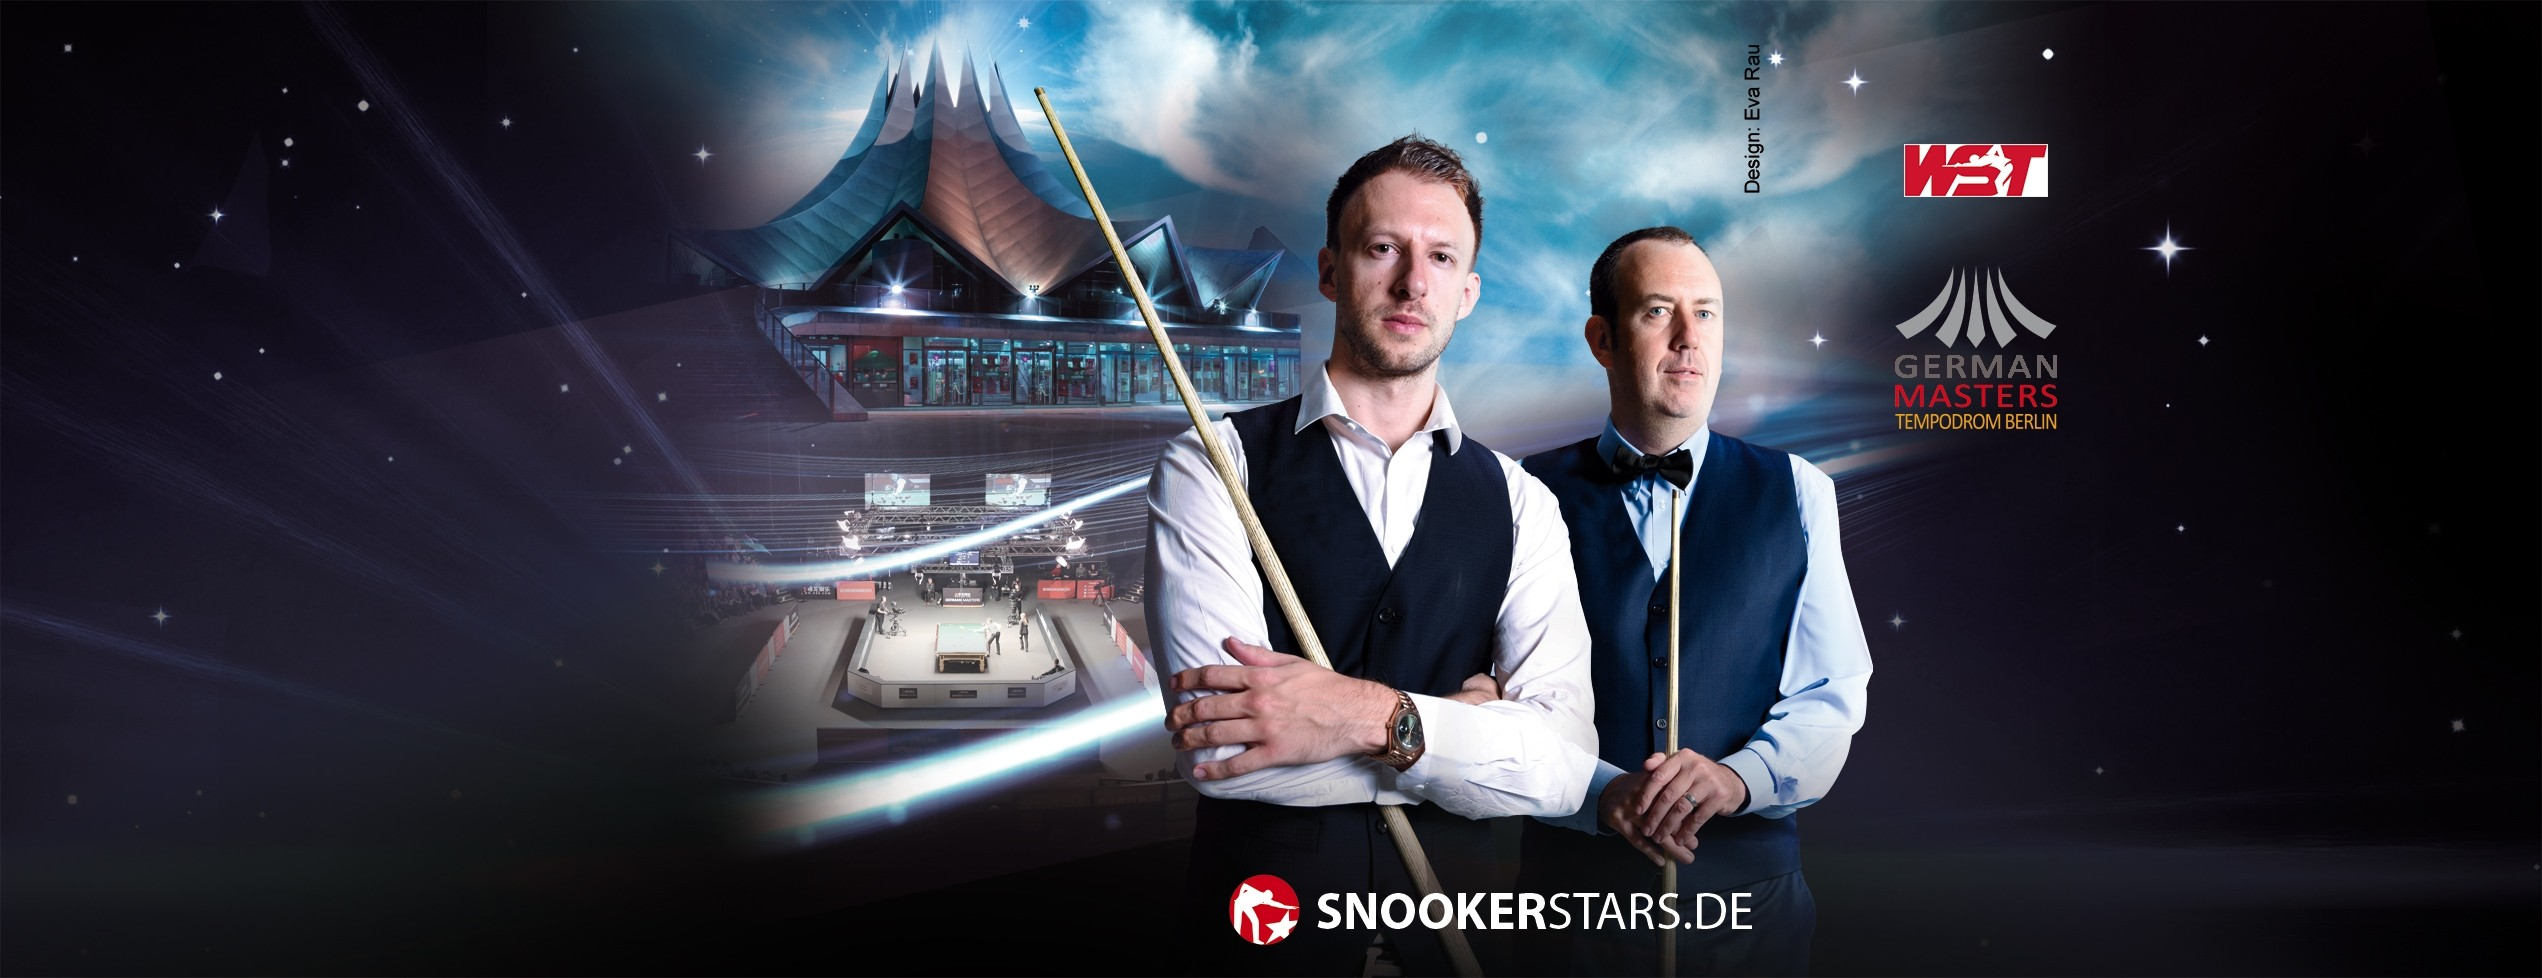 German Masters 27.01.2021 KAT 1 Abend-Session